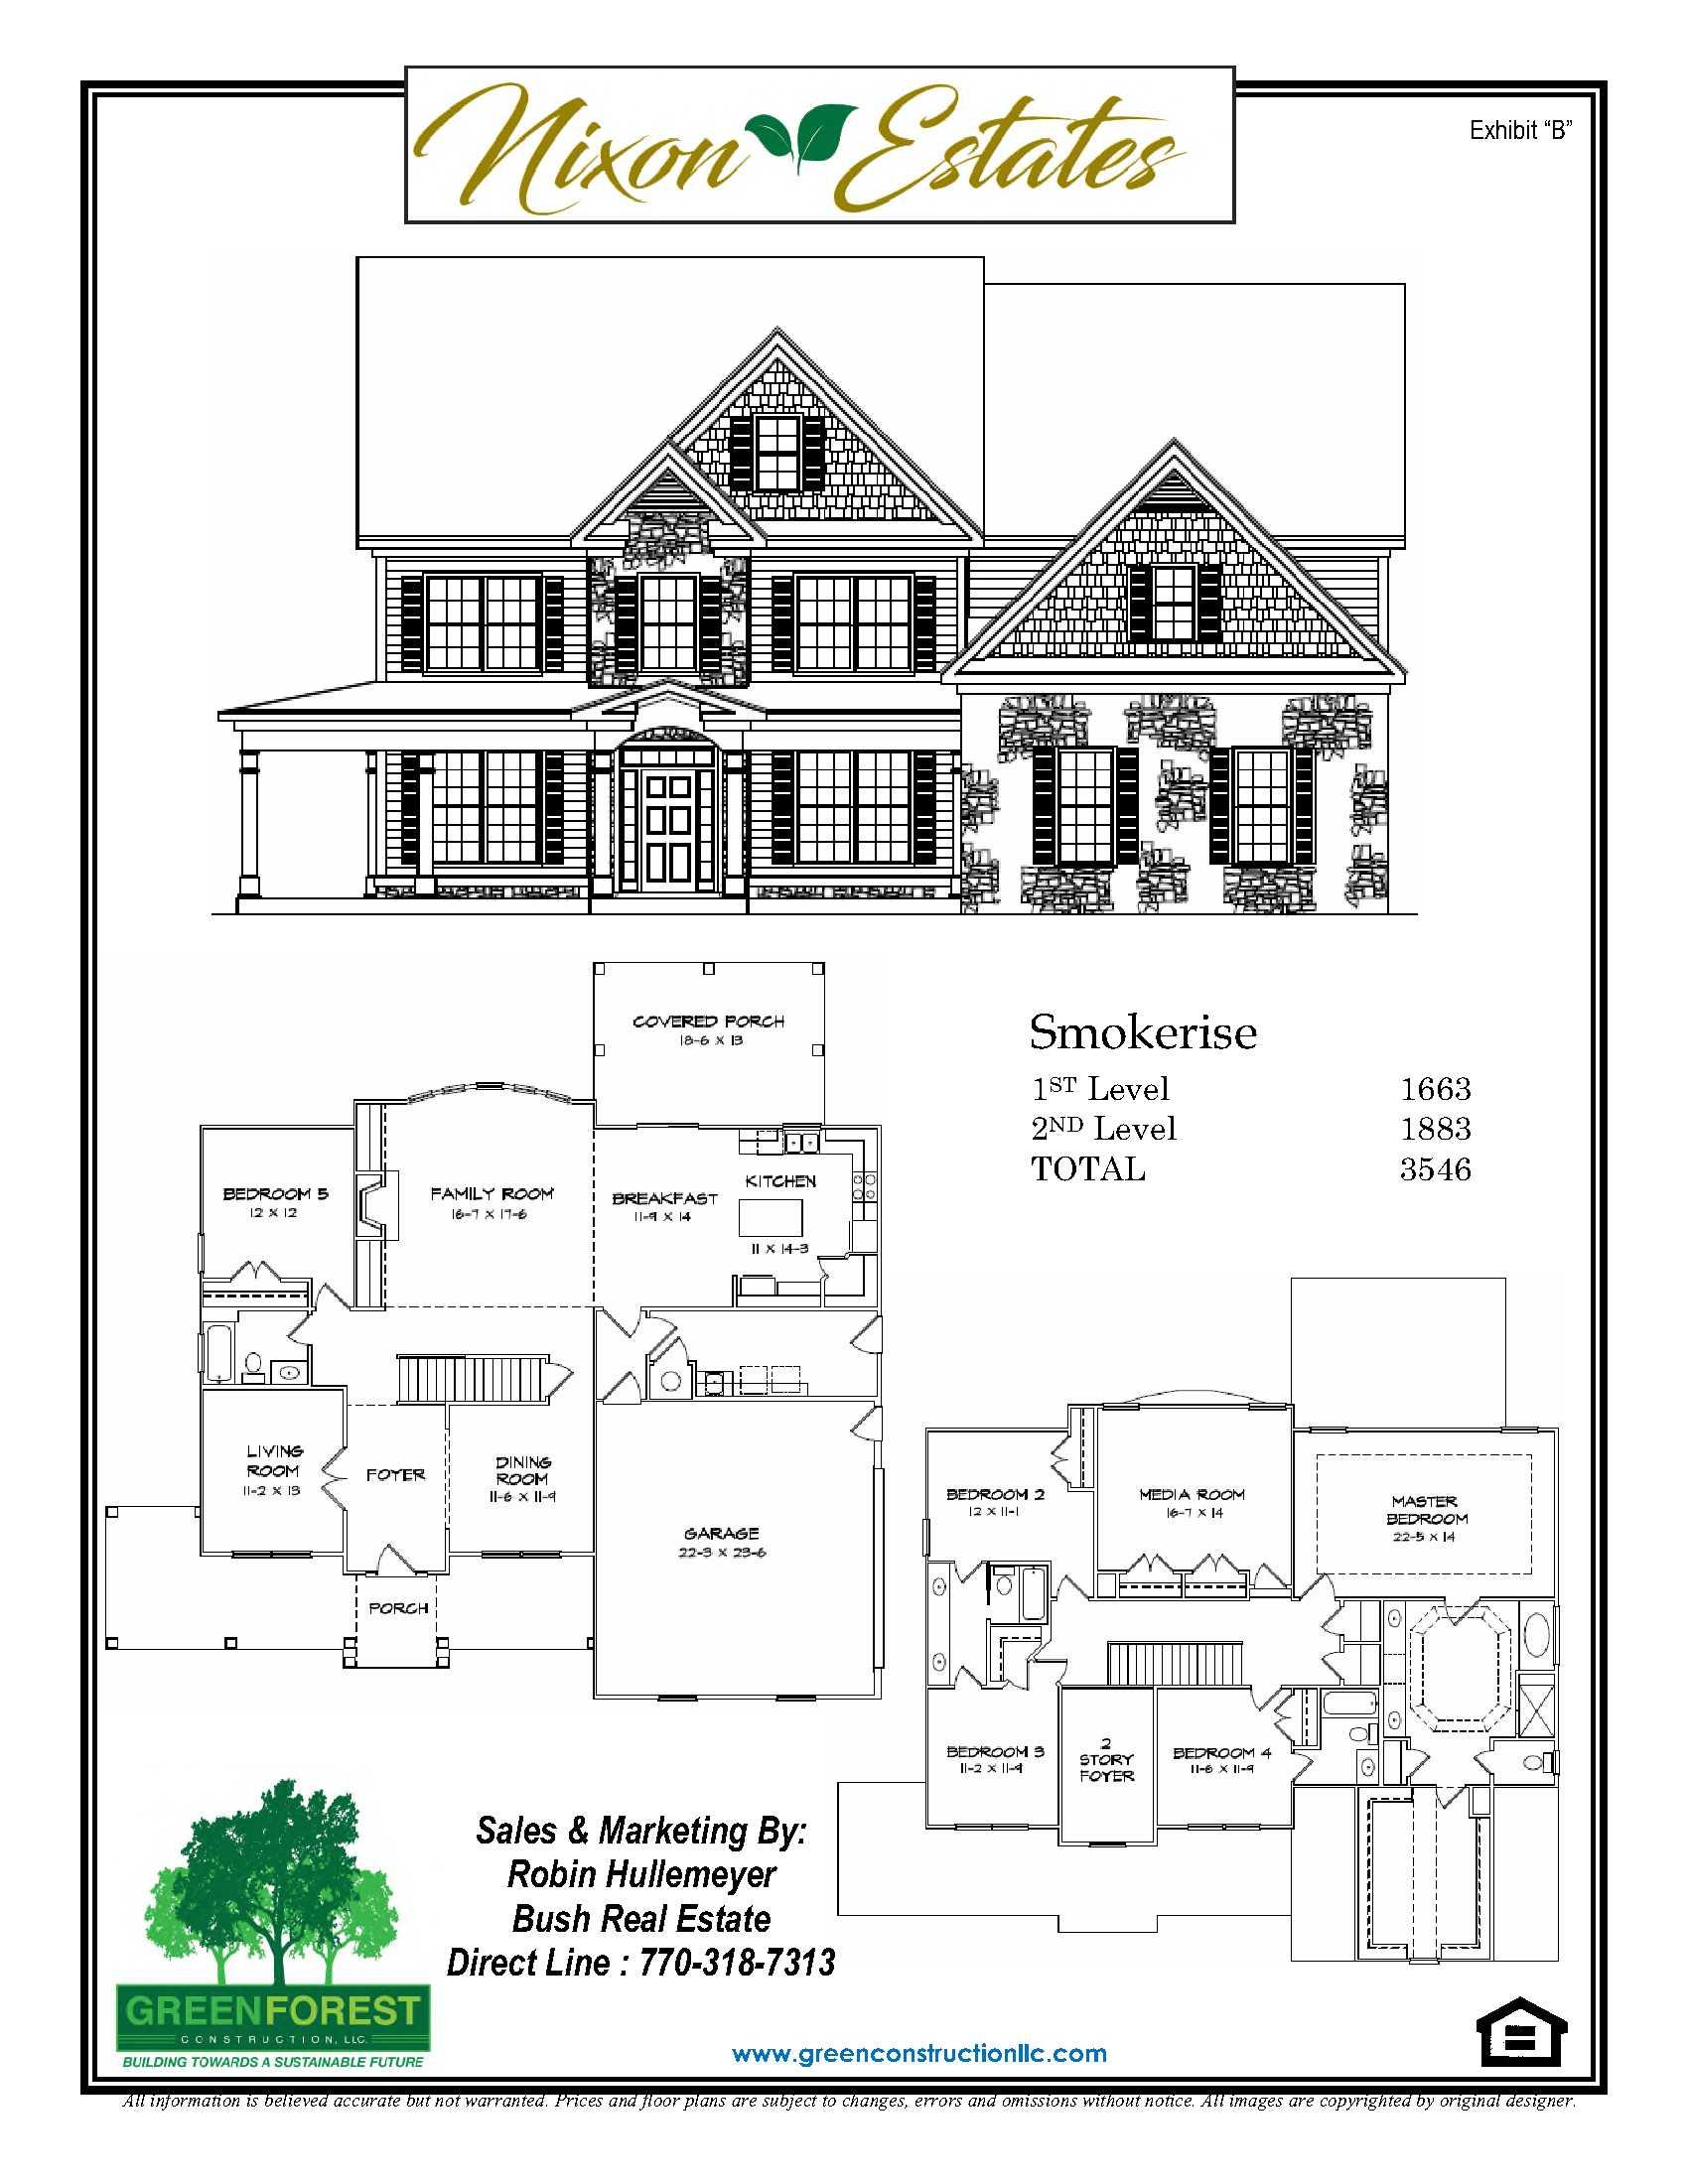 03.13.17 - Nixon Estates Full Package_5.jpg